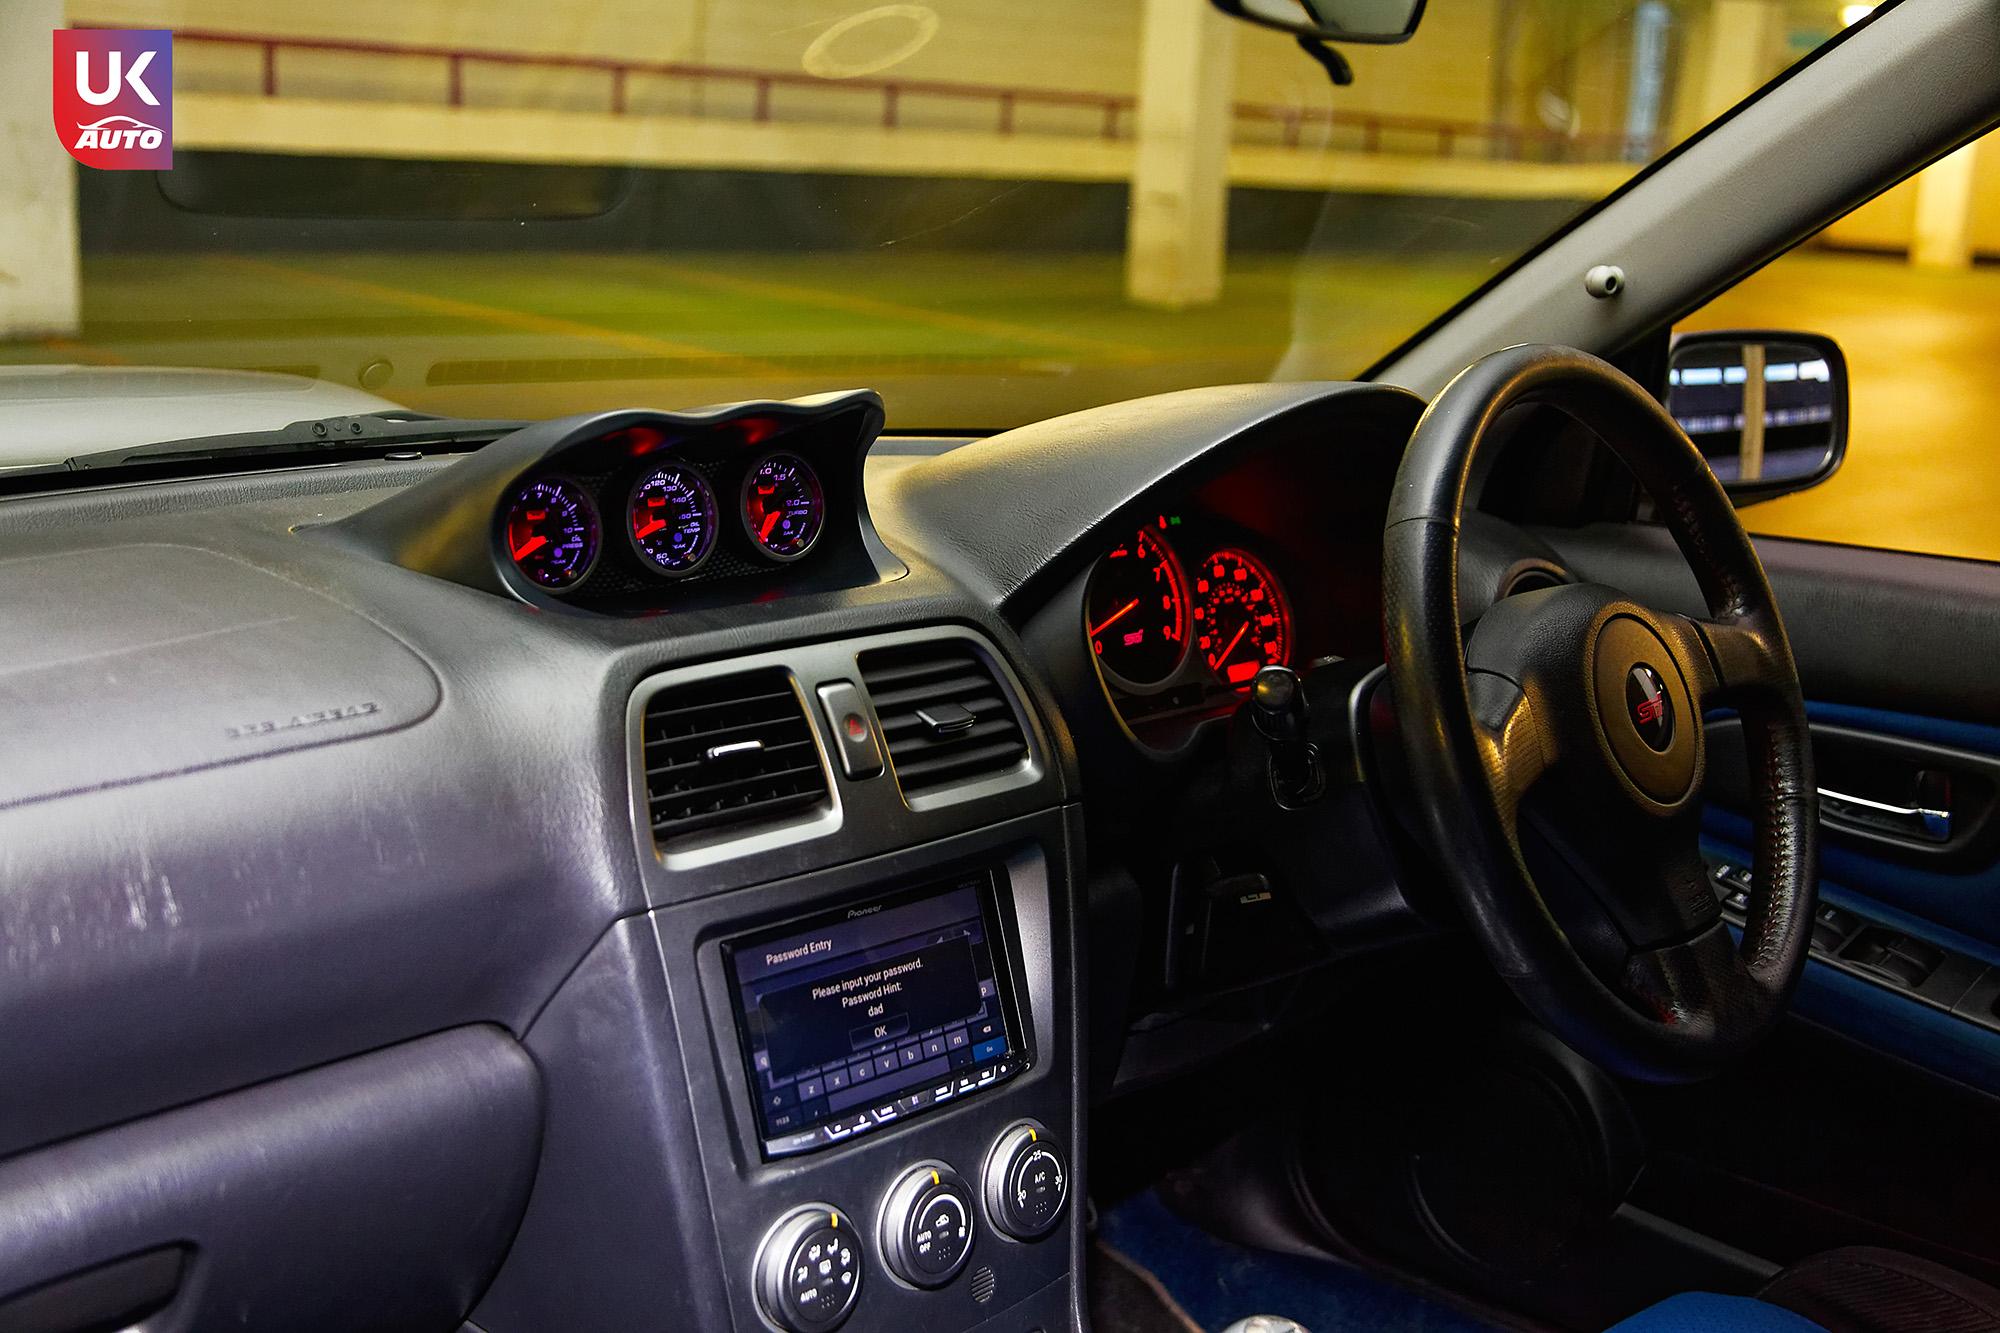 import subaru impreza wrx sti rhd import voiture angleterre auto import10 - Felecitation a Christophe pour cette Subaru Impreza Wrx Sti RHD Supercharged Importation voiture angleterre